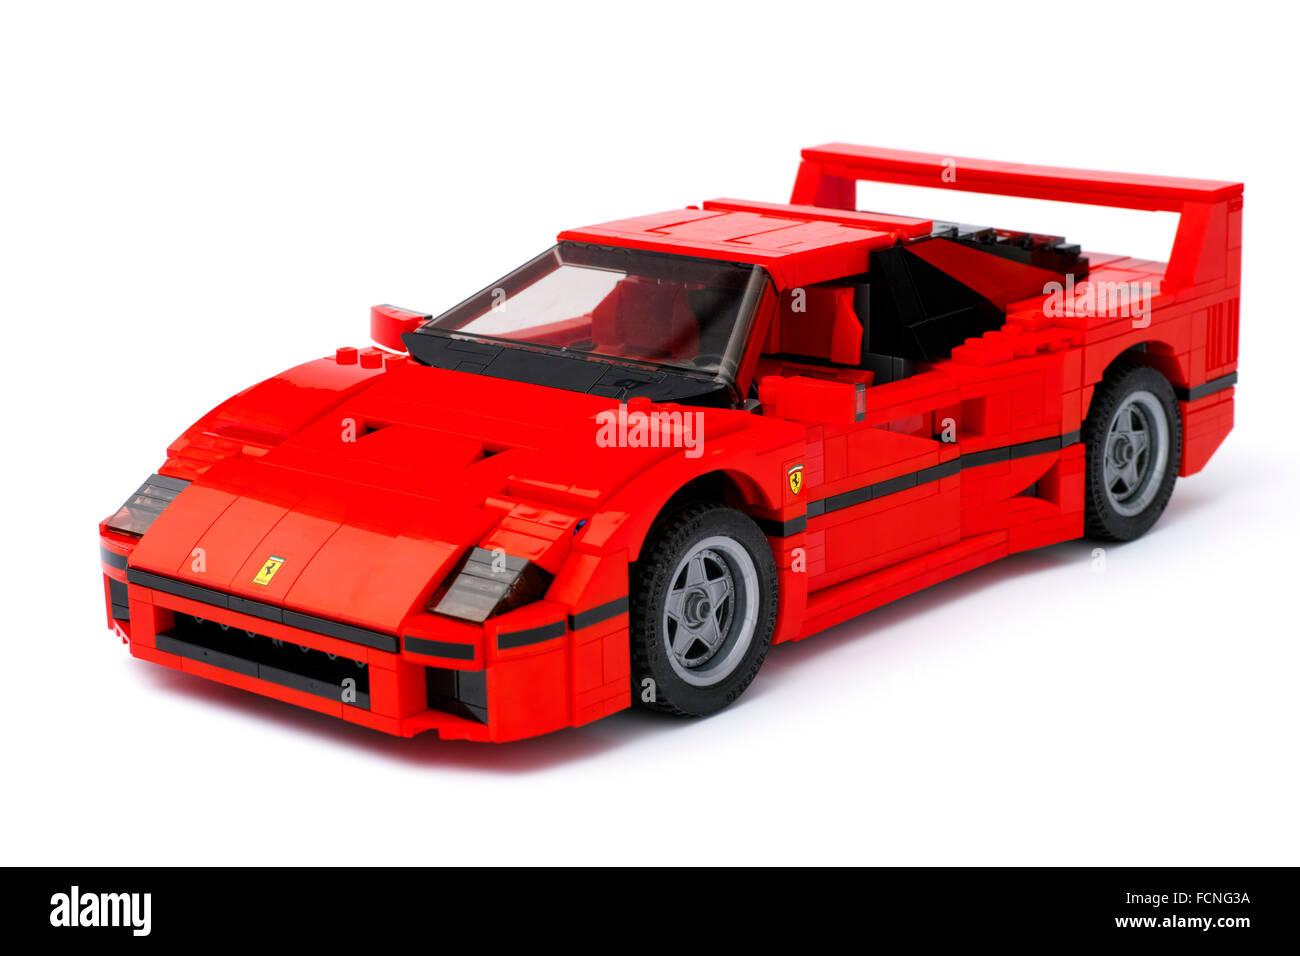 Tambov, Russian Federation - January 03, 2016 LEGO Creator Expert Ferrari F40 car on white background. Studio shot. - Stock Image